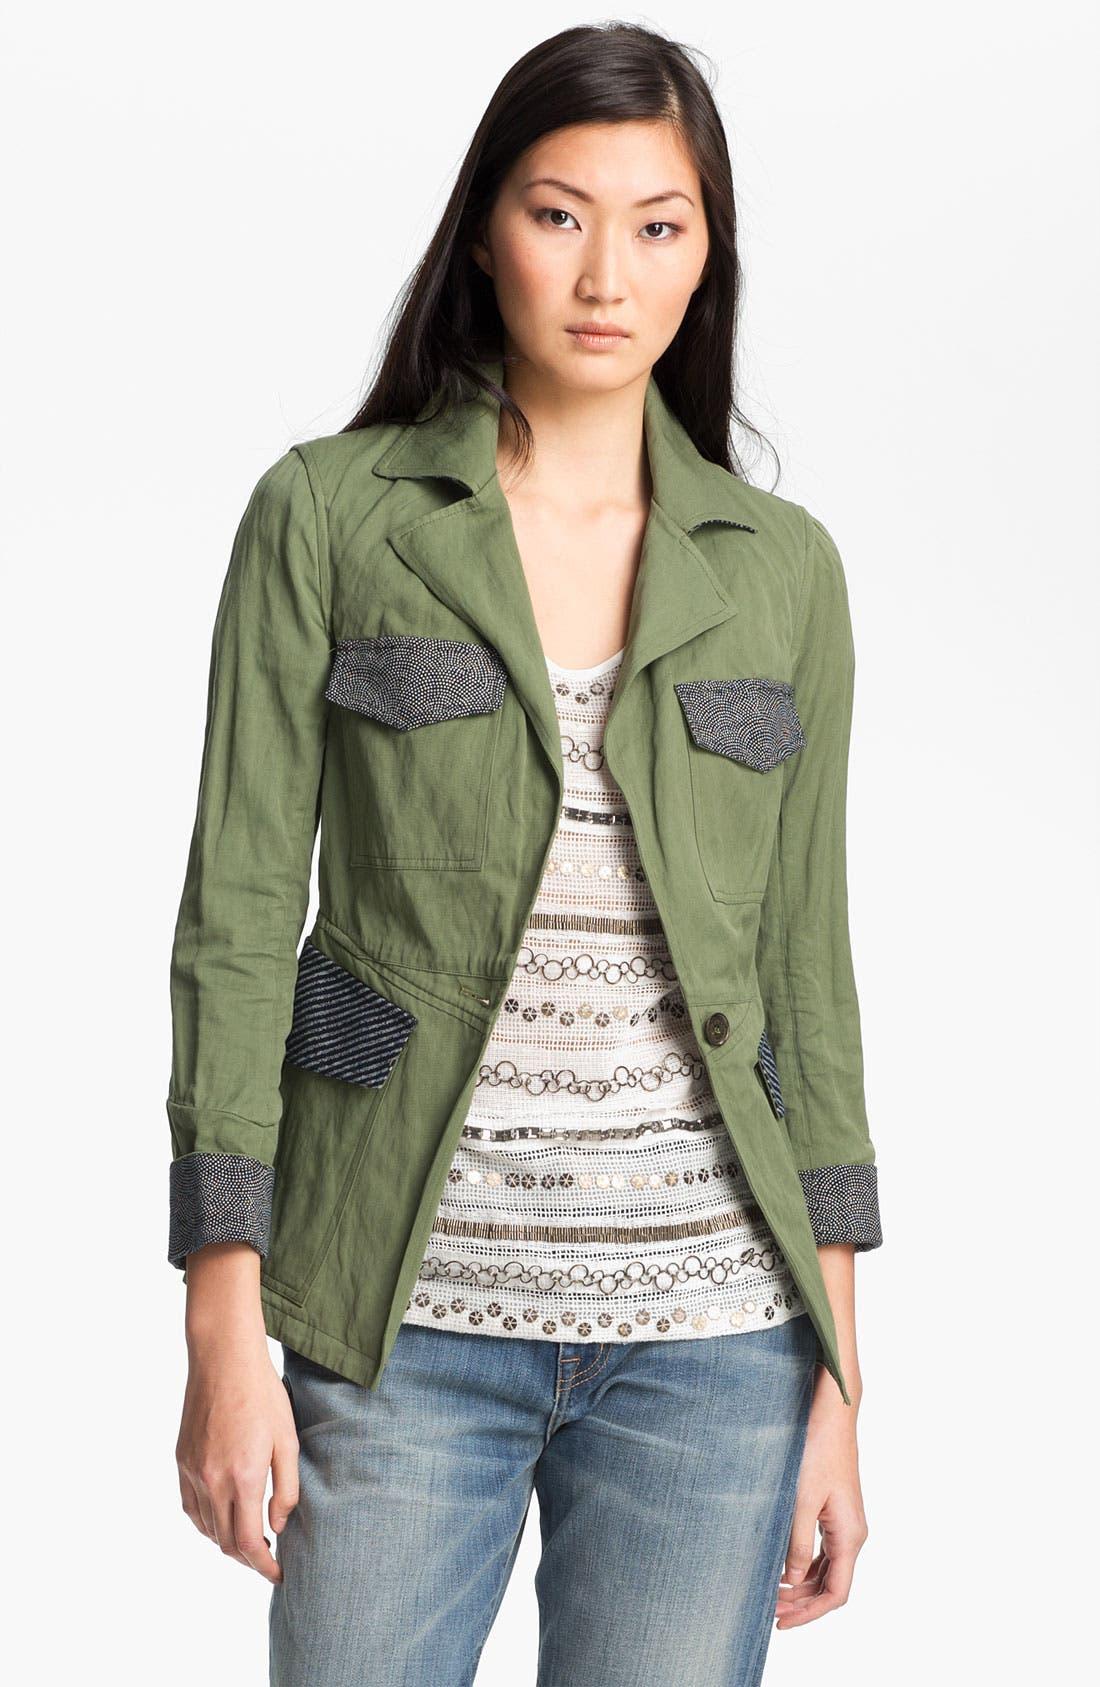 Alternate Image 1 Selected - Gryphon 'Tomboy' Jacket